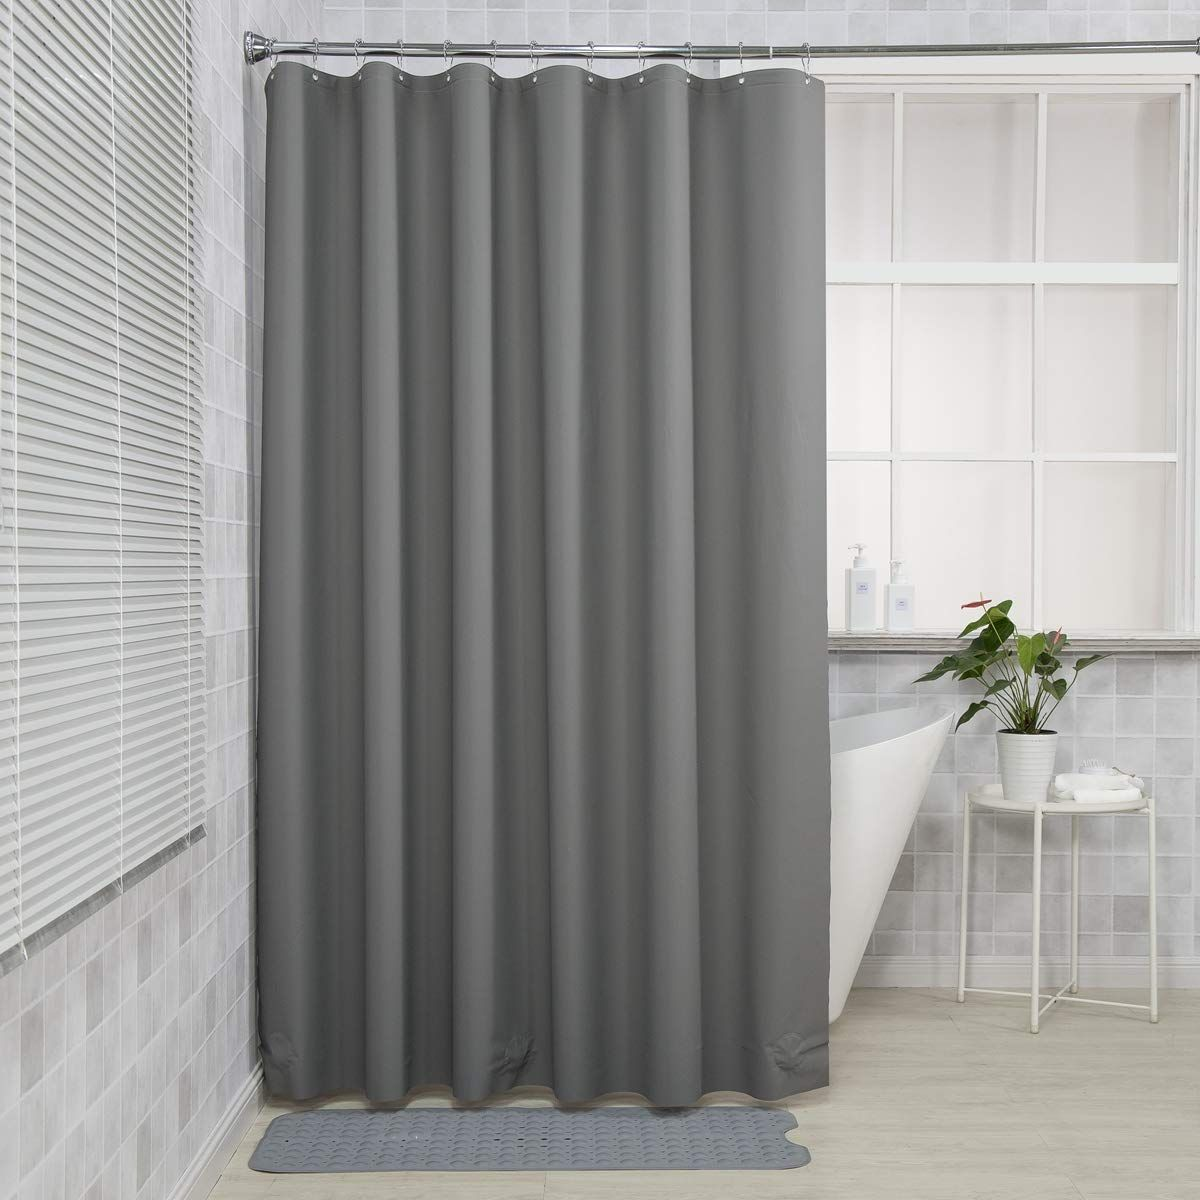 Amazerbath Plastic Shower Curtain 72 W X 72 H Eva 8g Shower